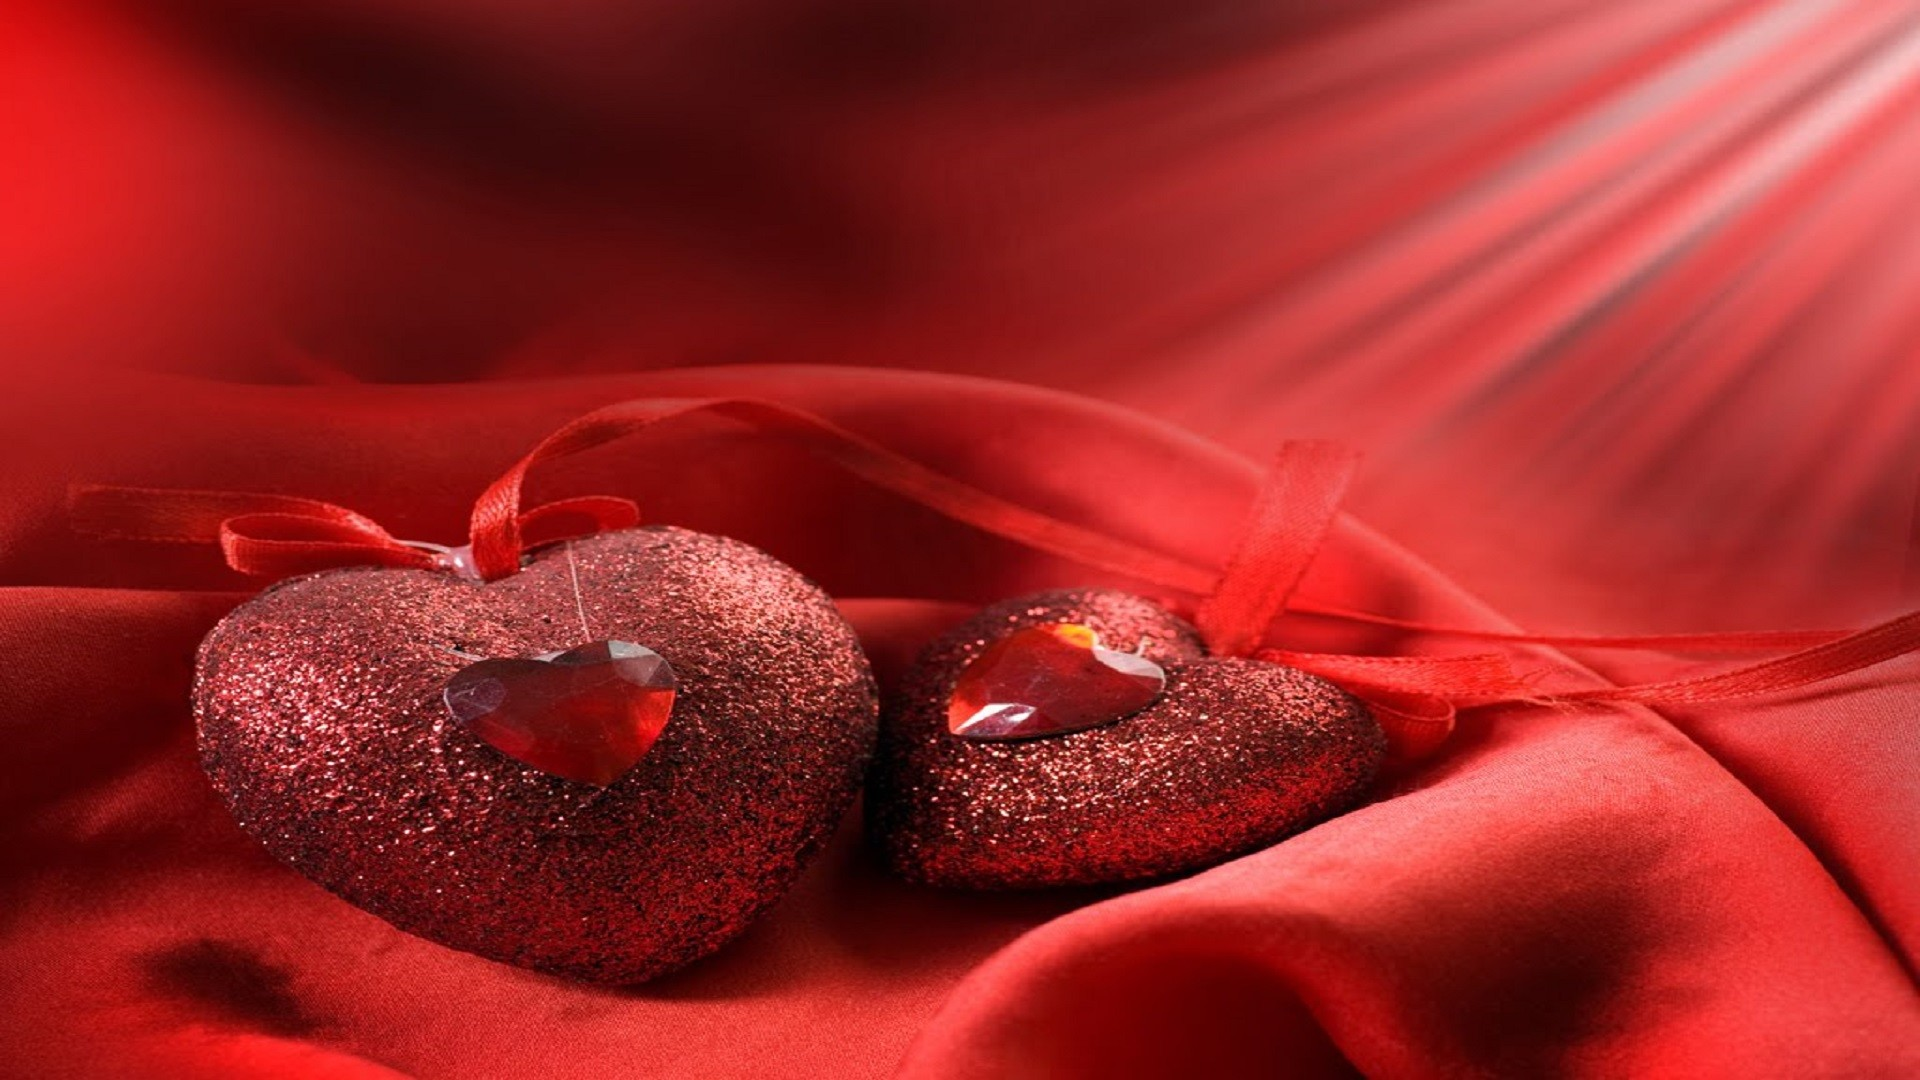 Red heart hd free wallpaper